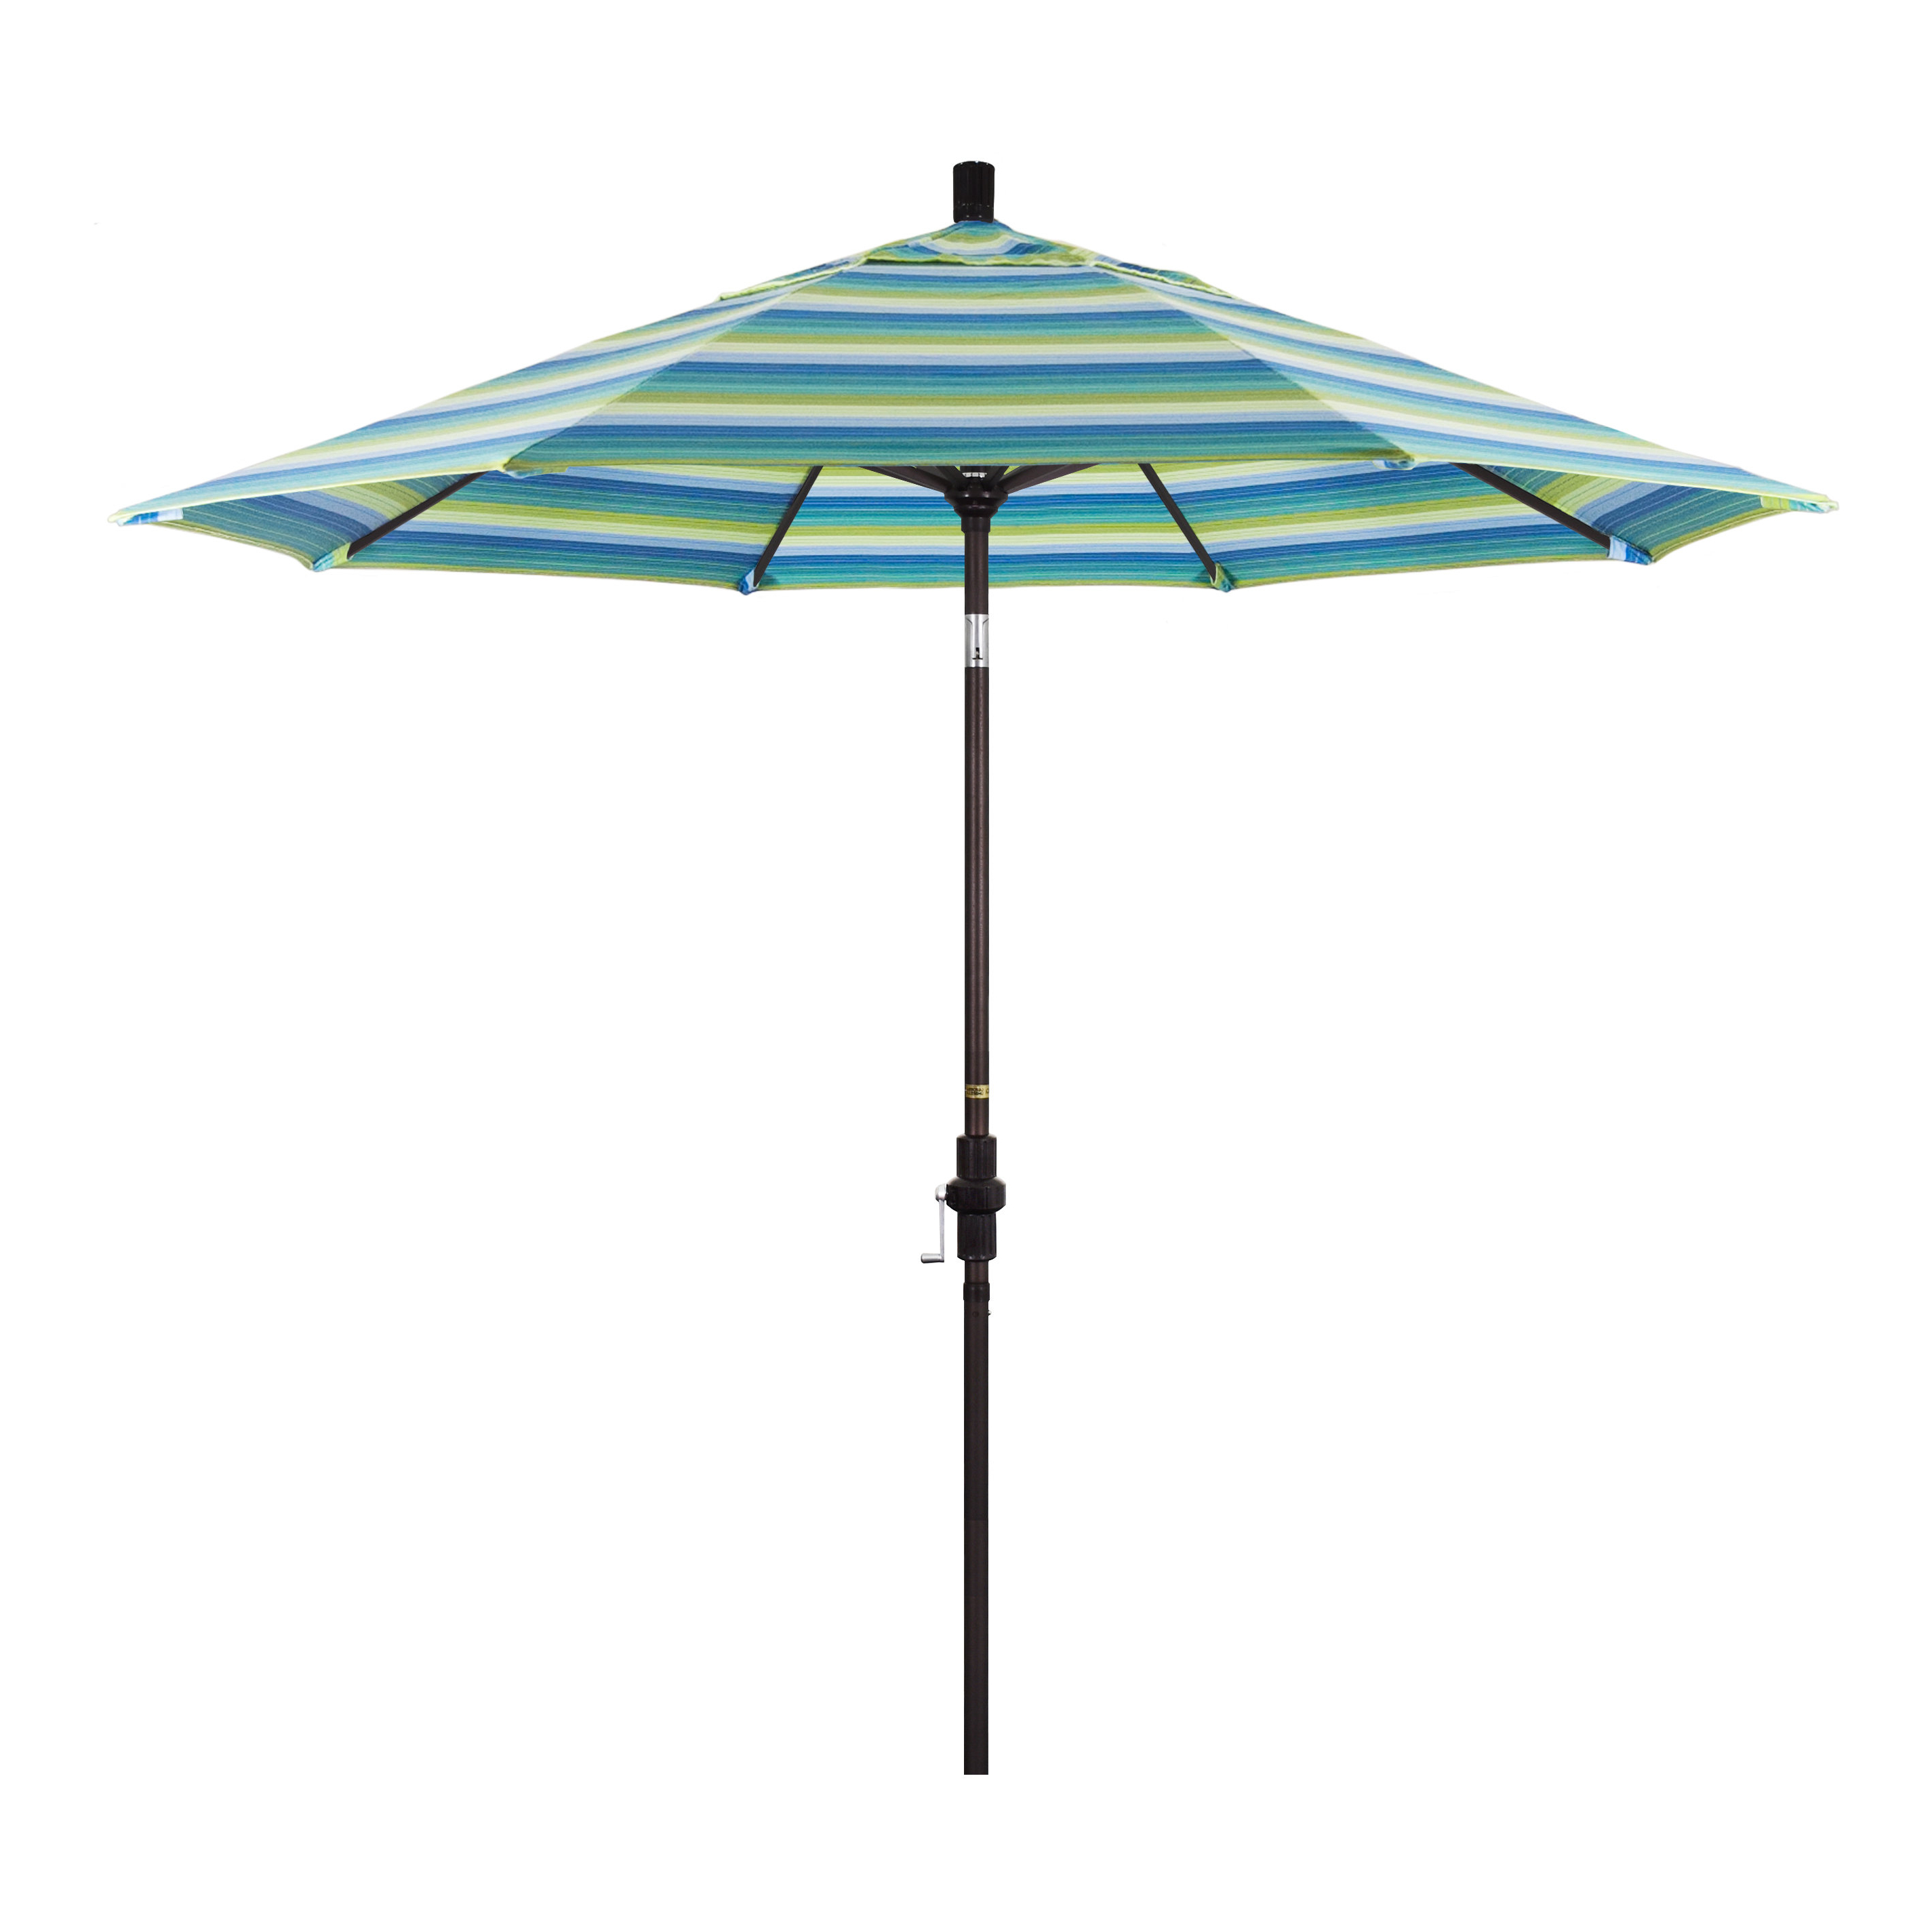 Golden State Series 9' Market Sunbrella Umbrella For Popular Wiechmann Push Tilt Market Sunbrella Umbrellas (Gallery 10 of 20)